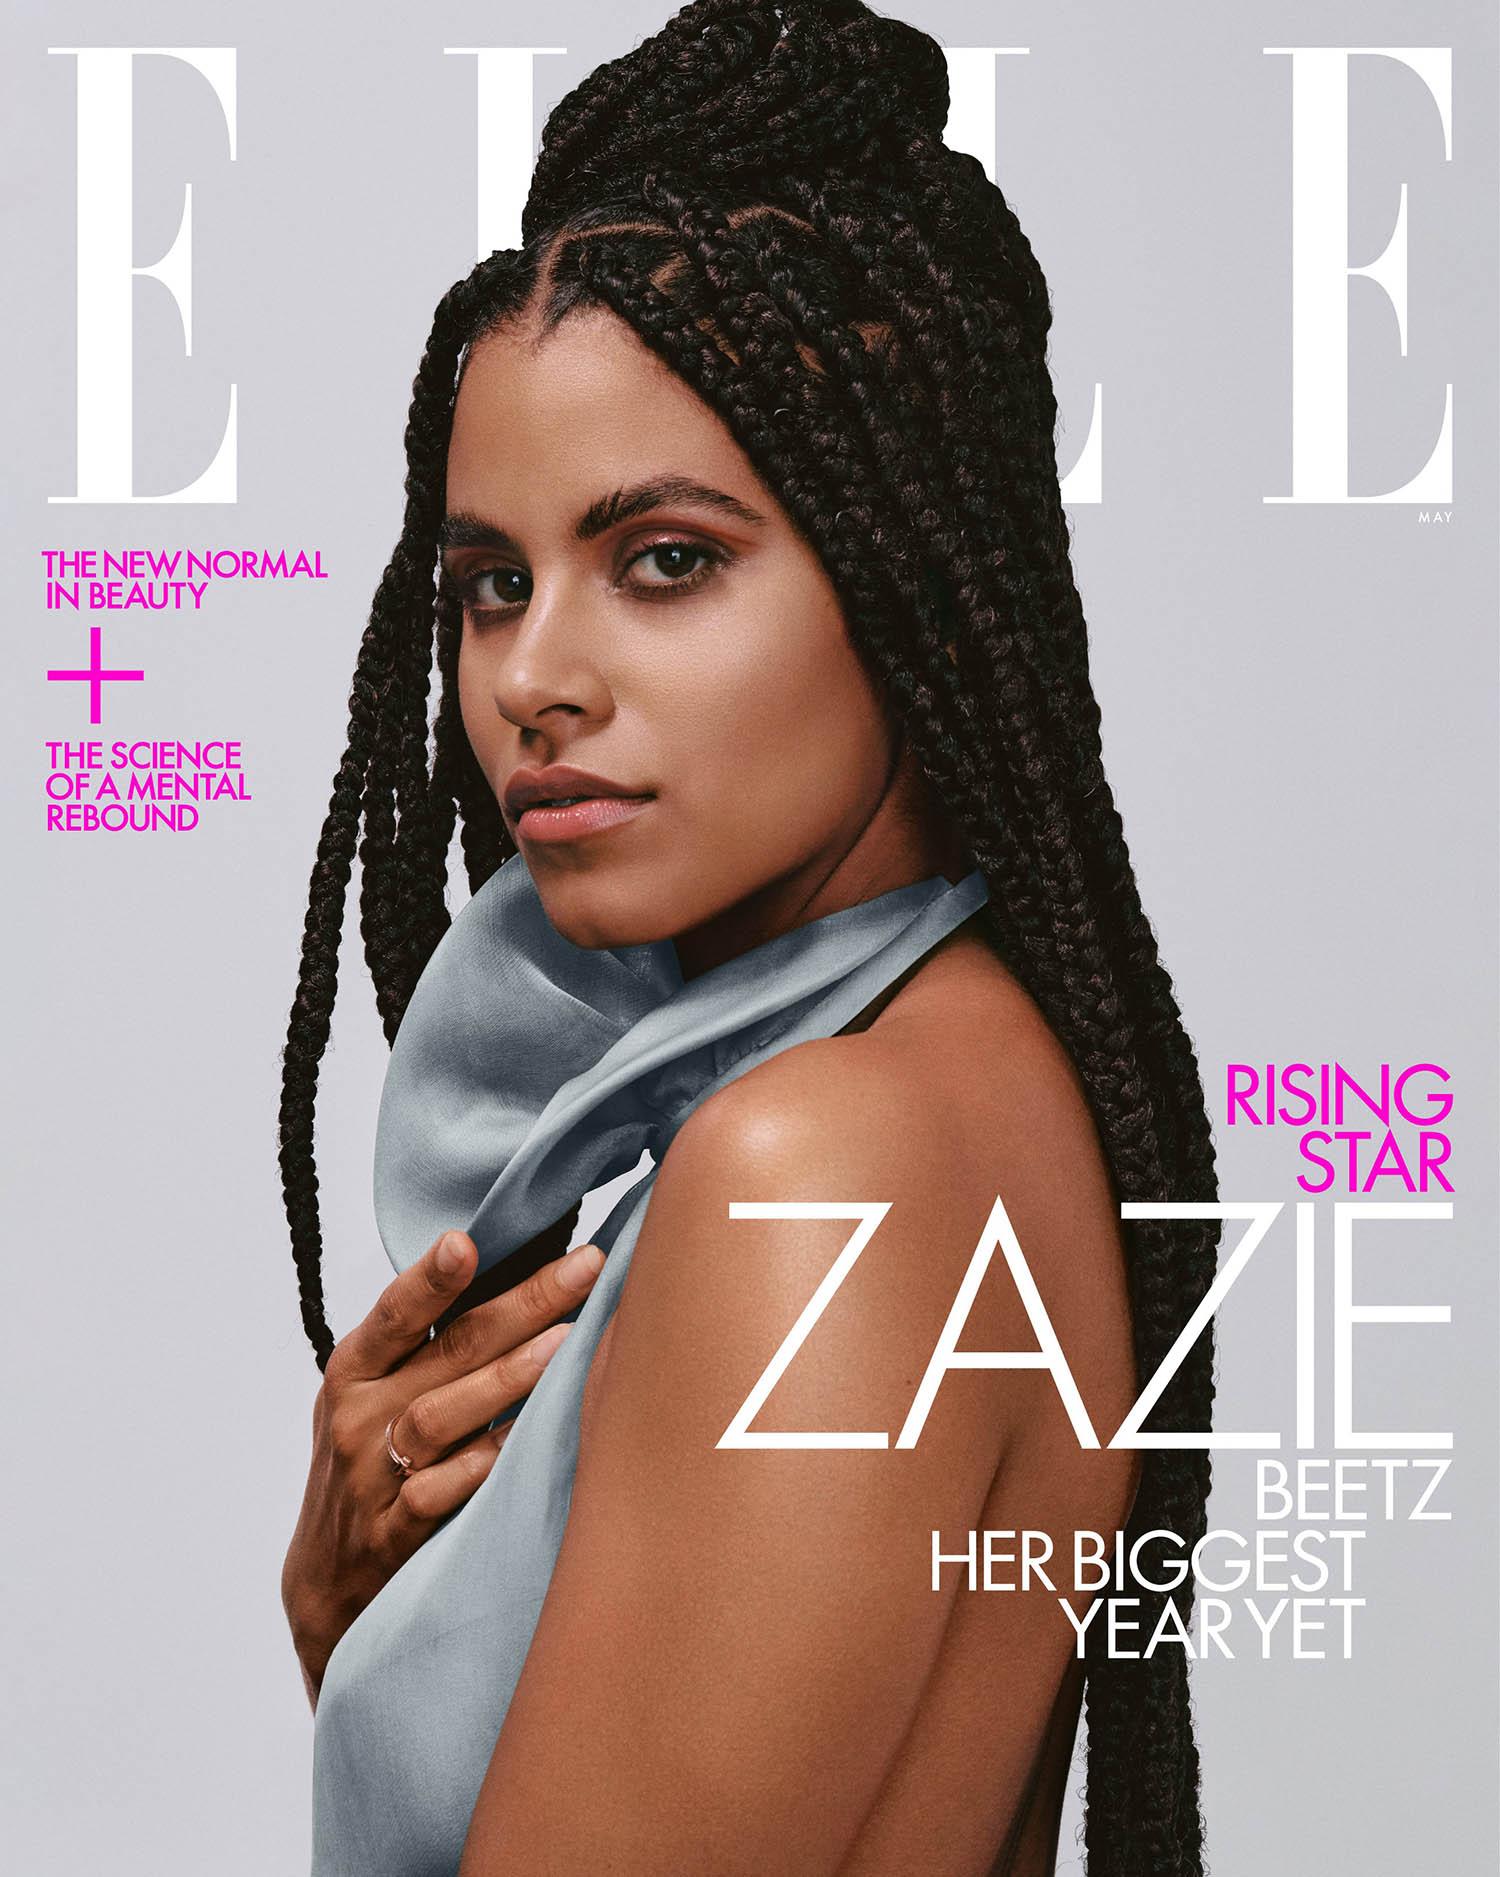 Zazie Beetz covers Elle US May 2021 by Adrienne Raquel